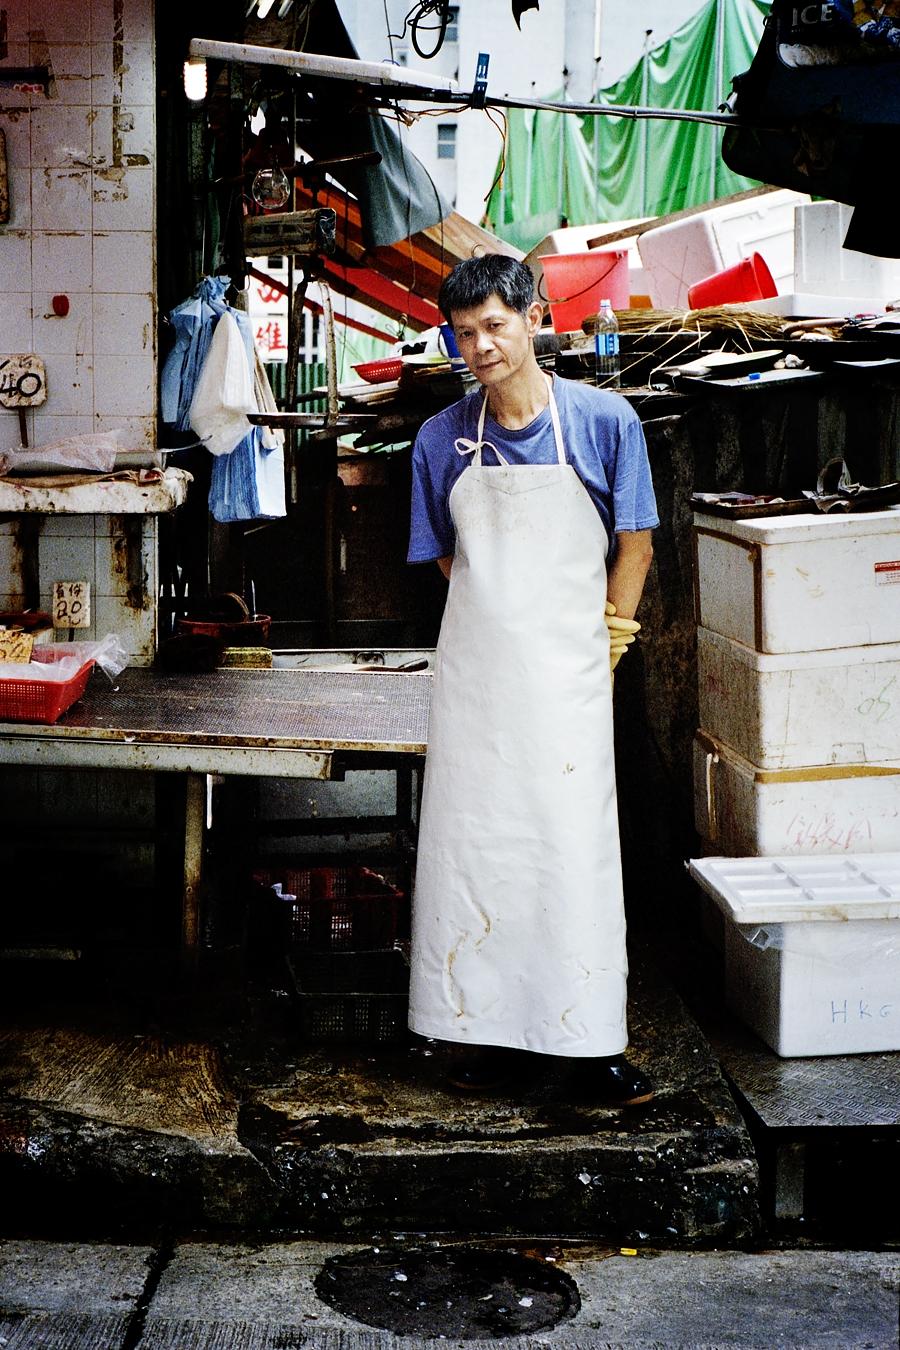 Maud WALAS Street Photography HONG KONG 19.jpg